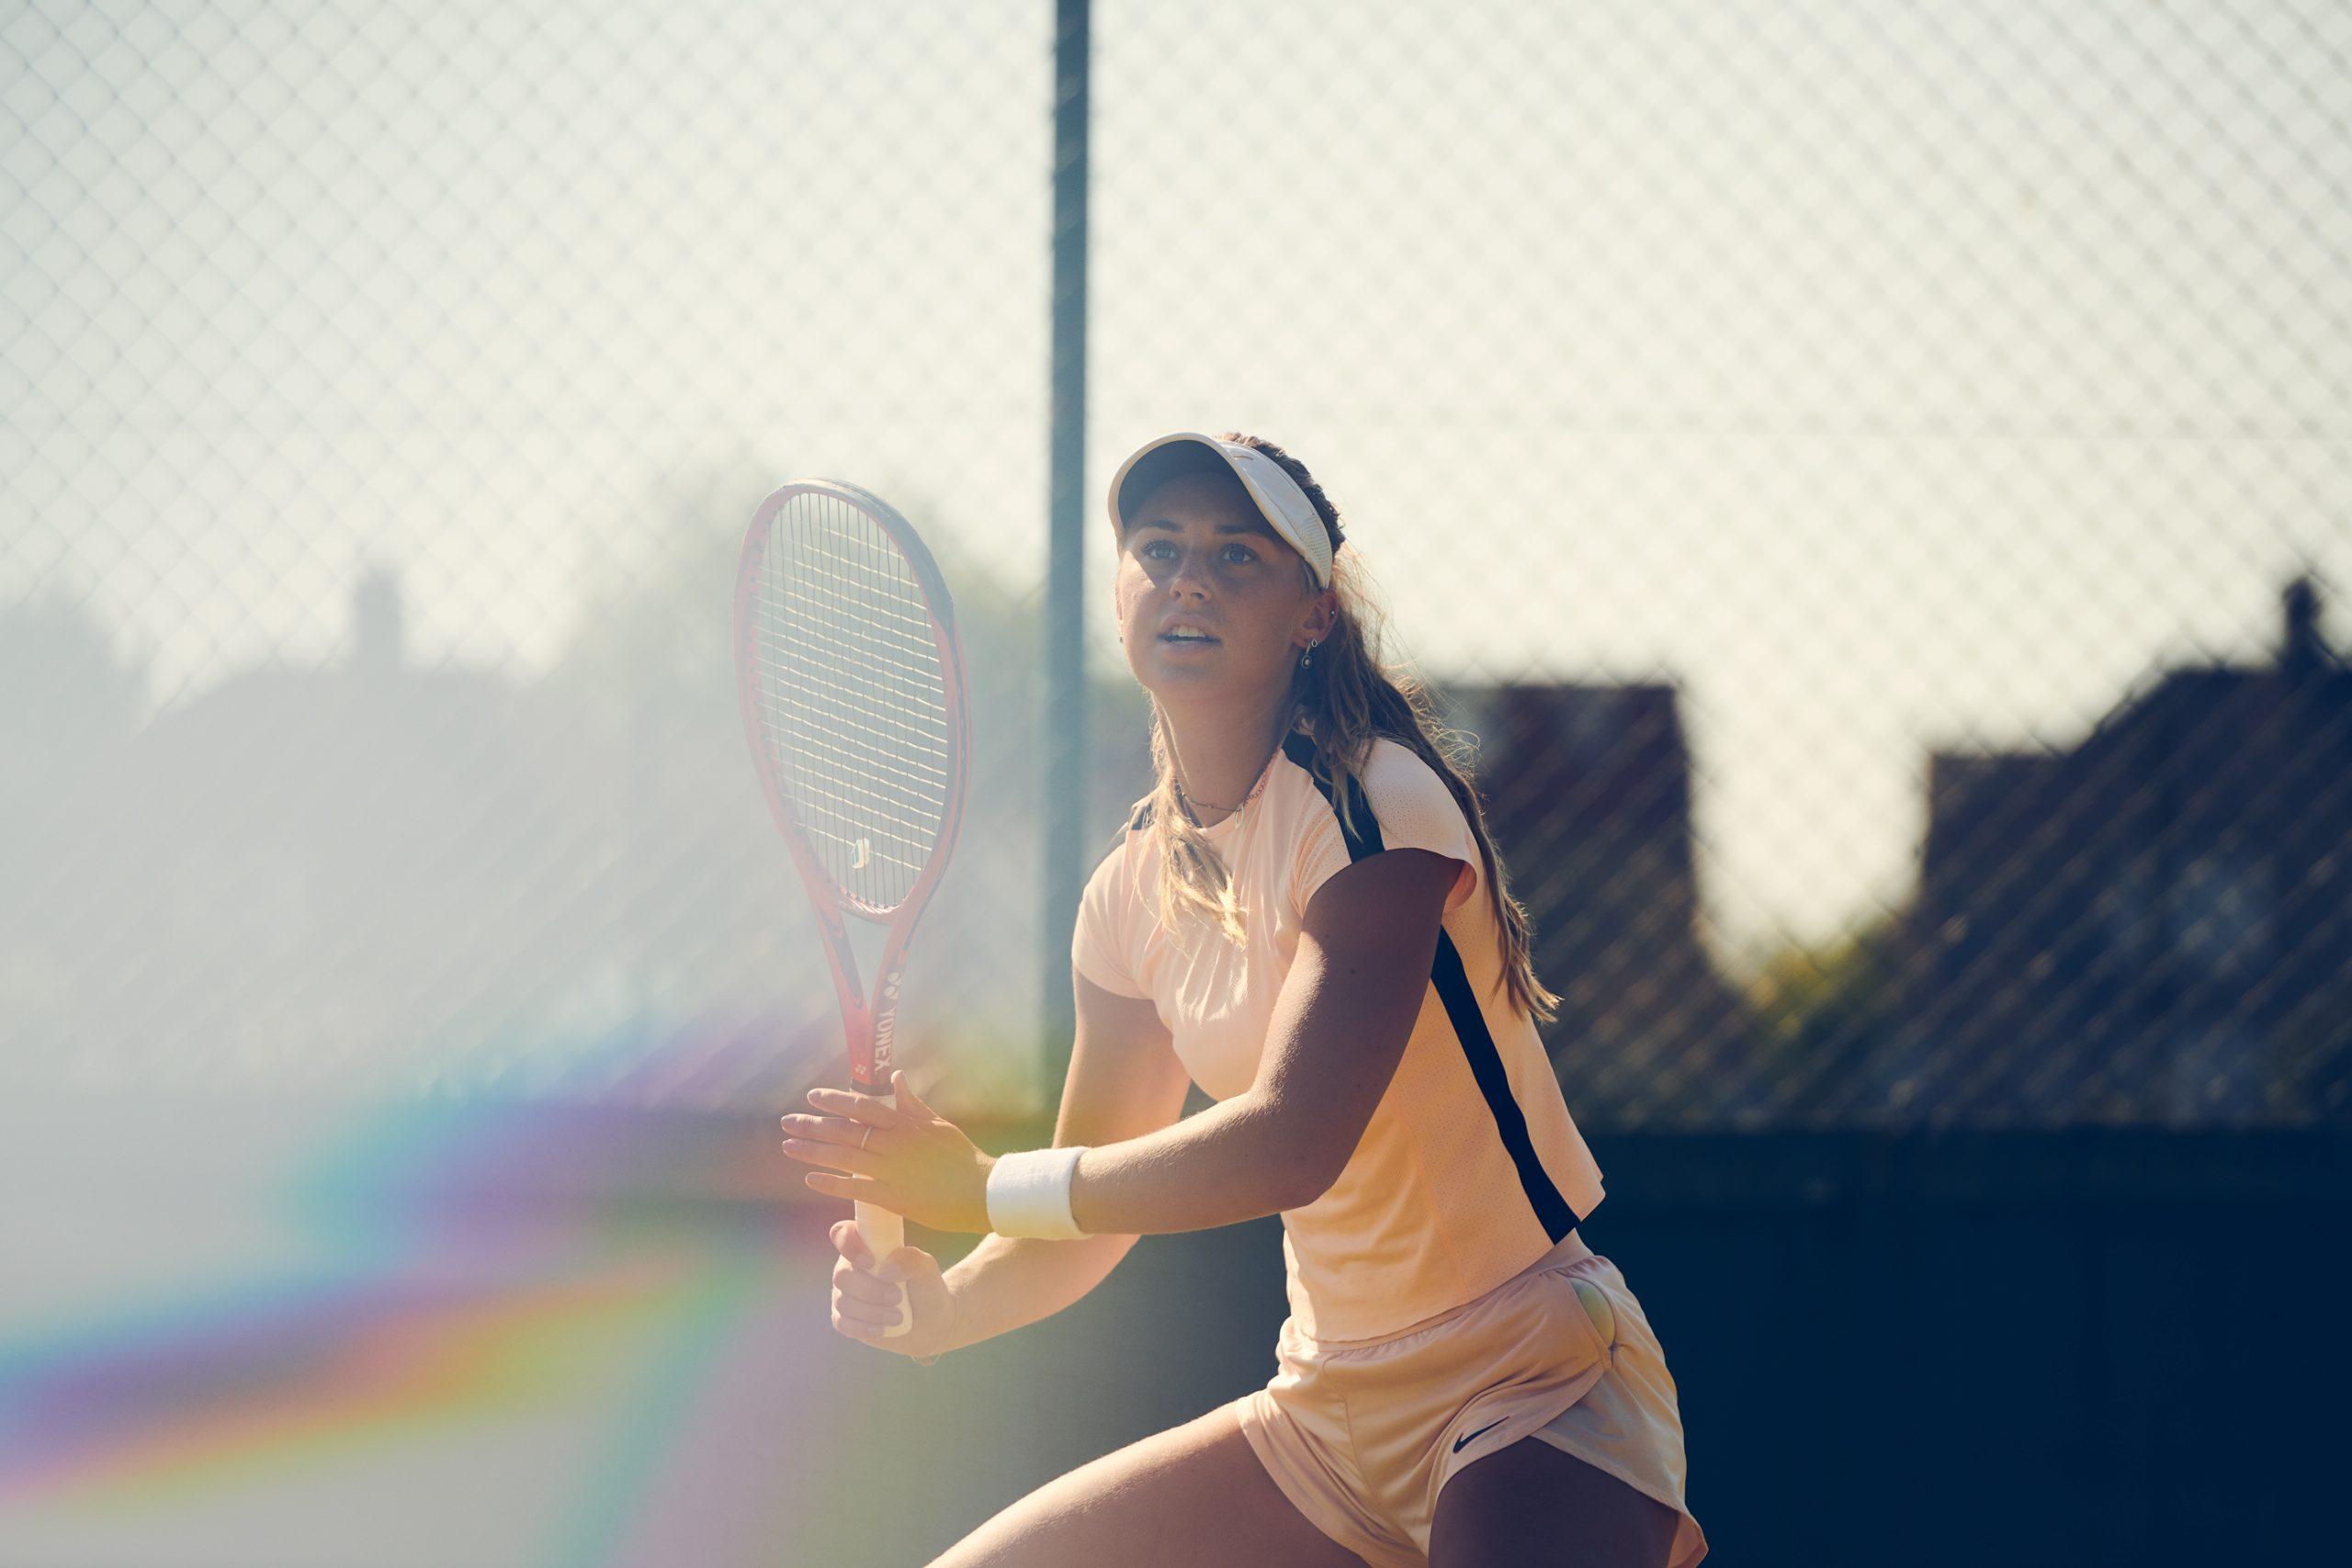 Forte_Olivia_Tennis_0338